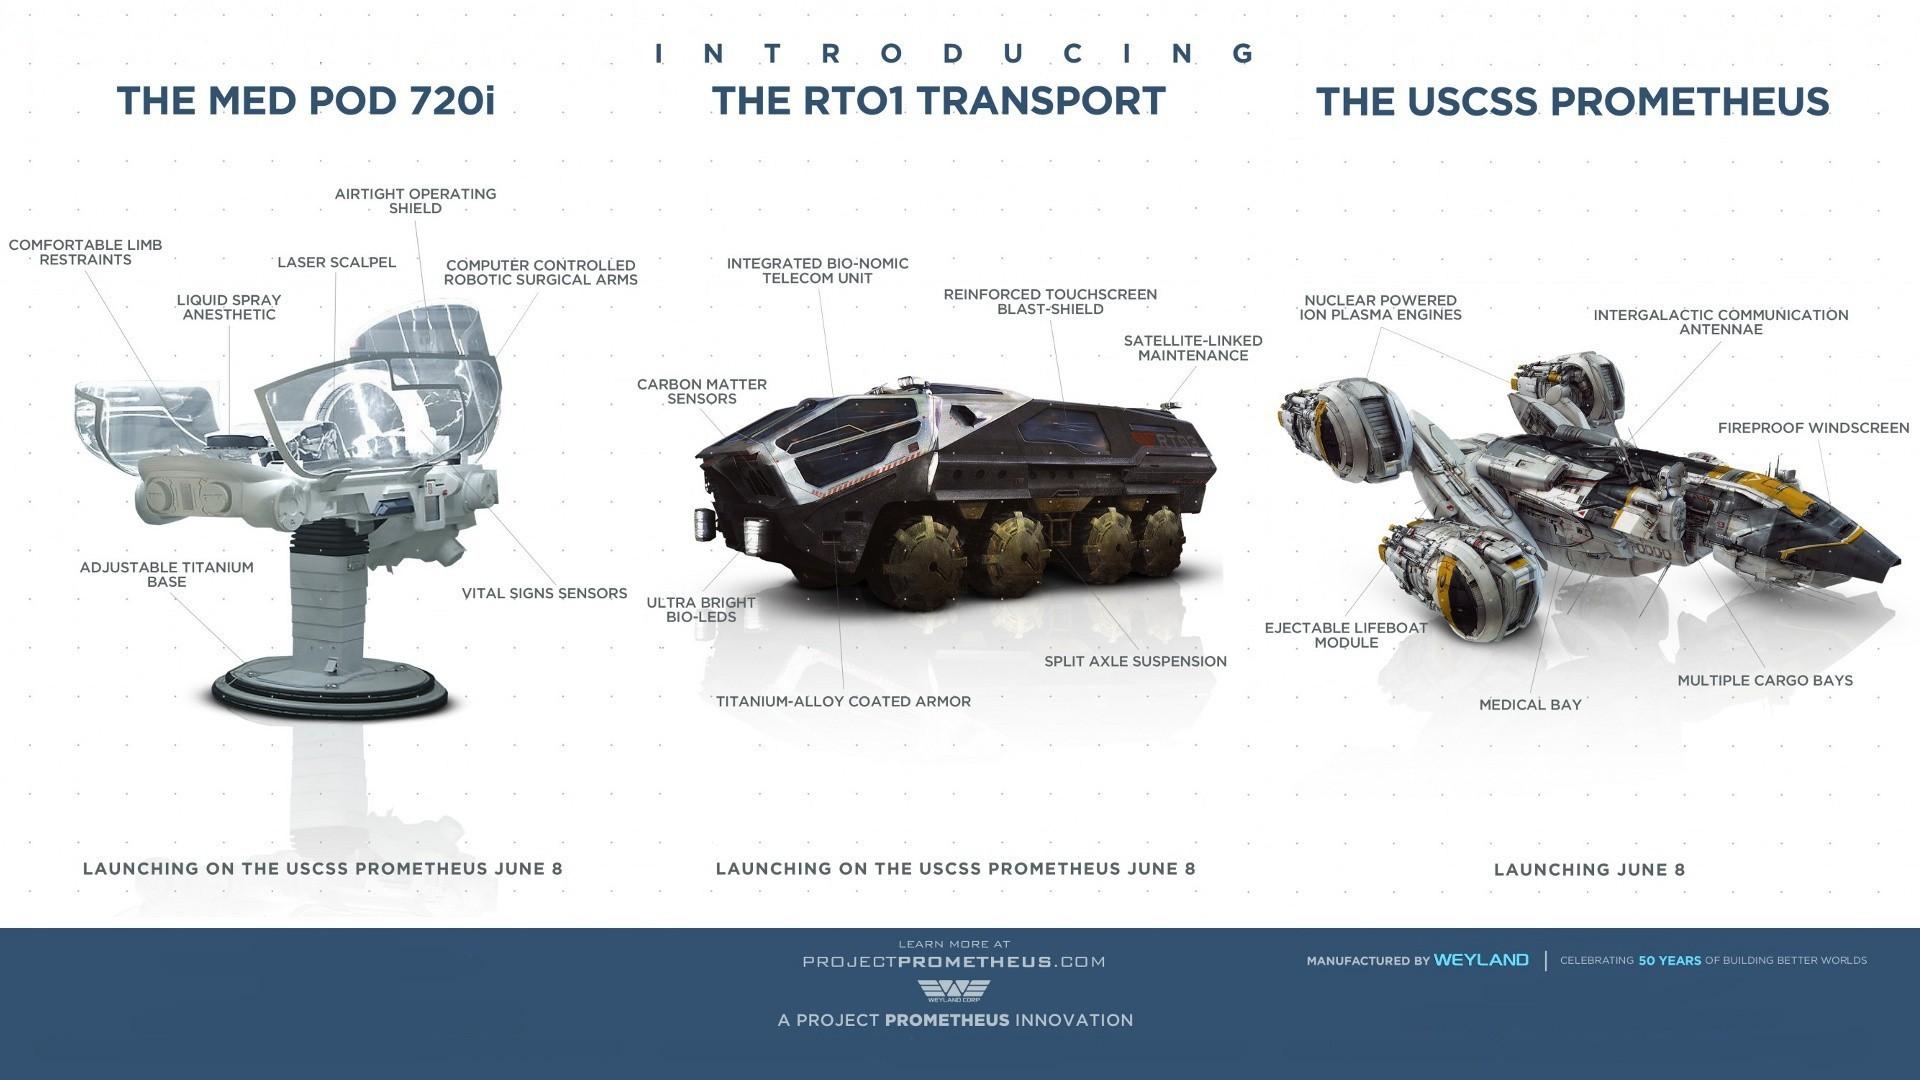 Hintergrundbilder : Platz, Fahrzeug, Raumschiff, Marke, Prometheus ...